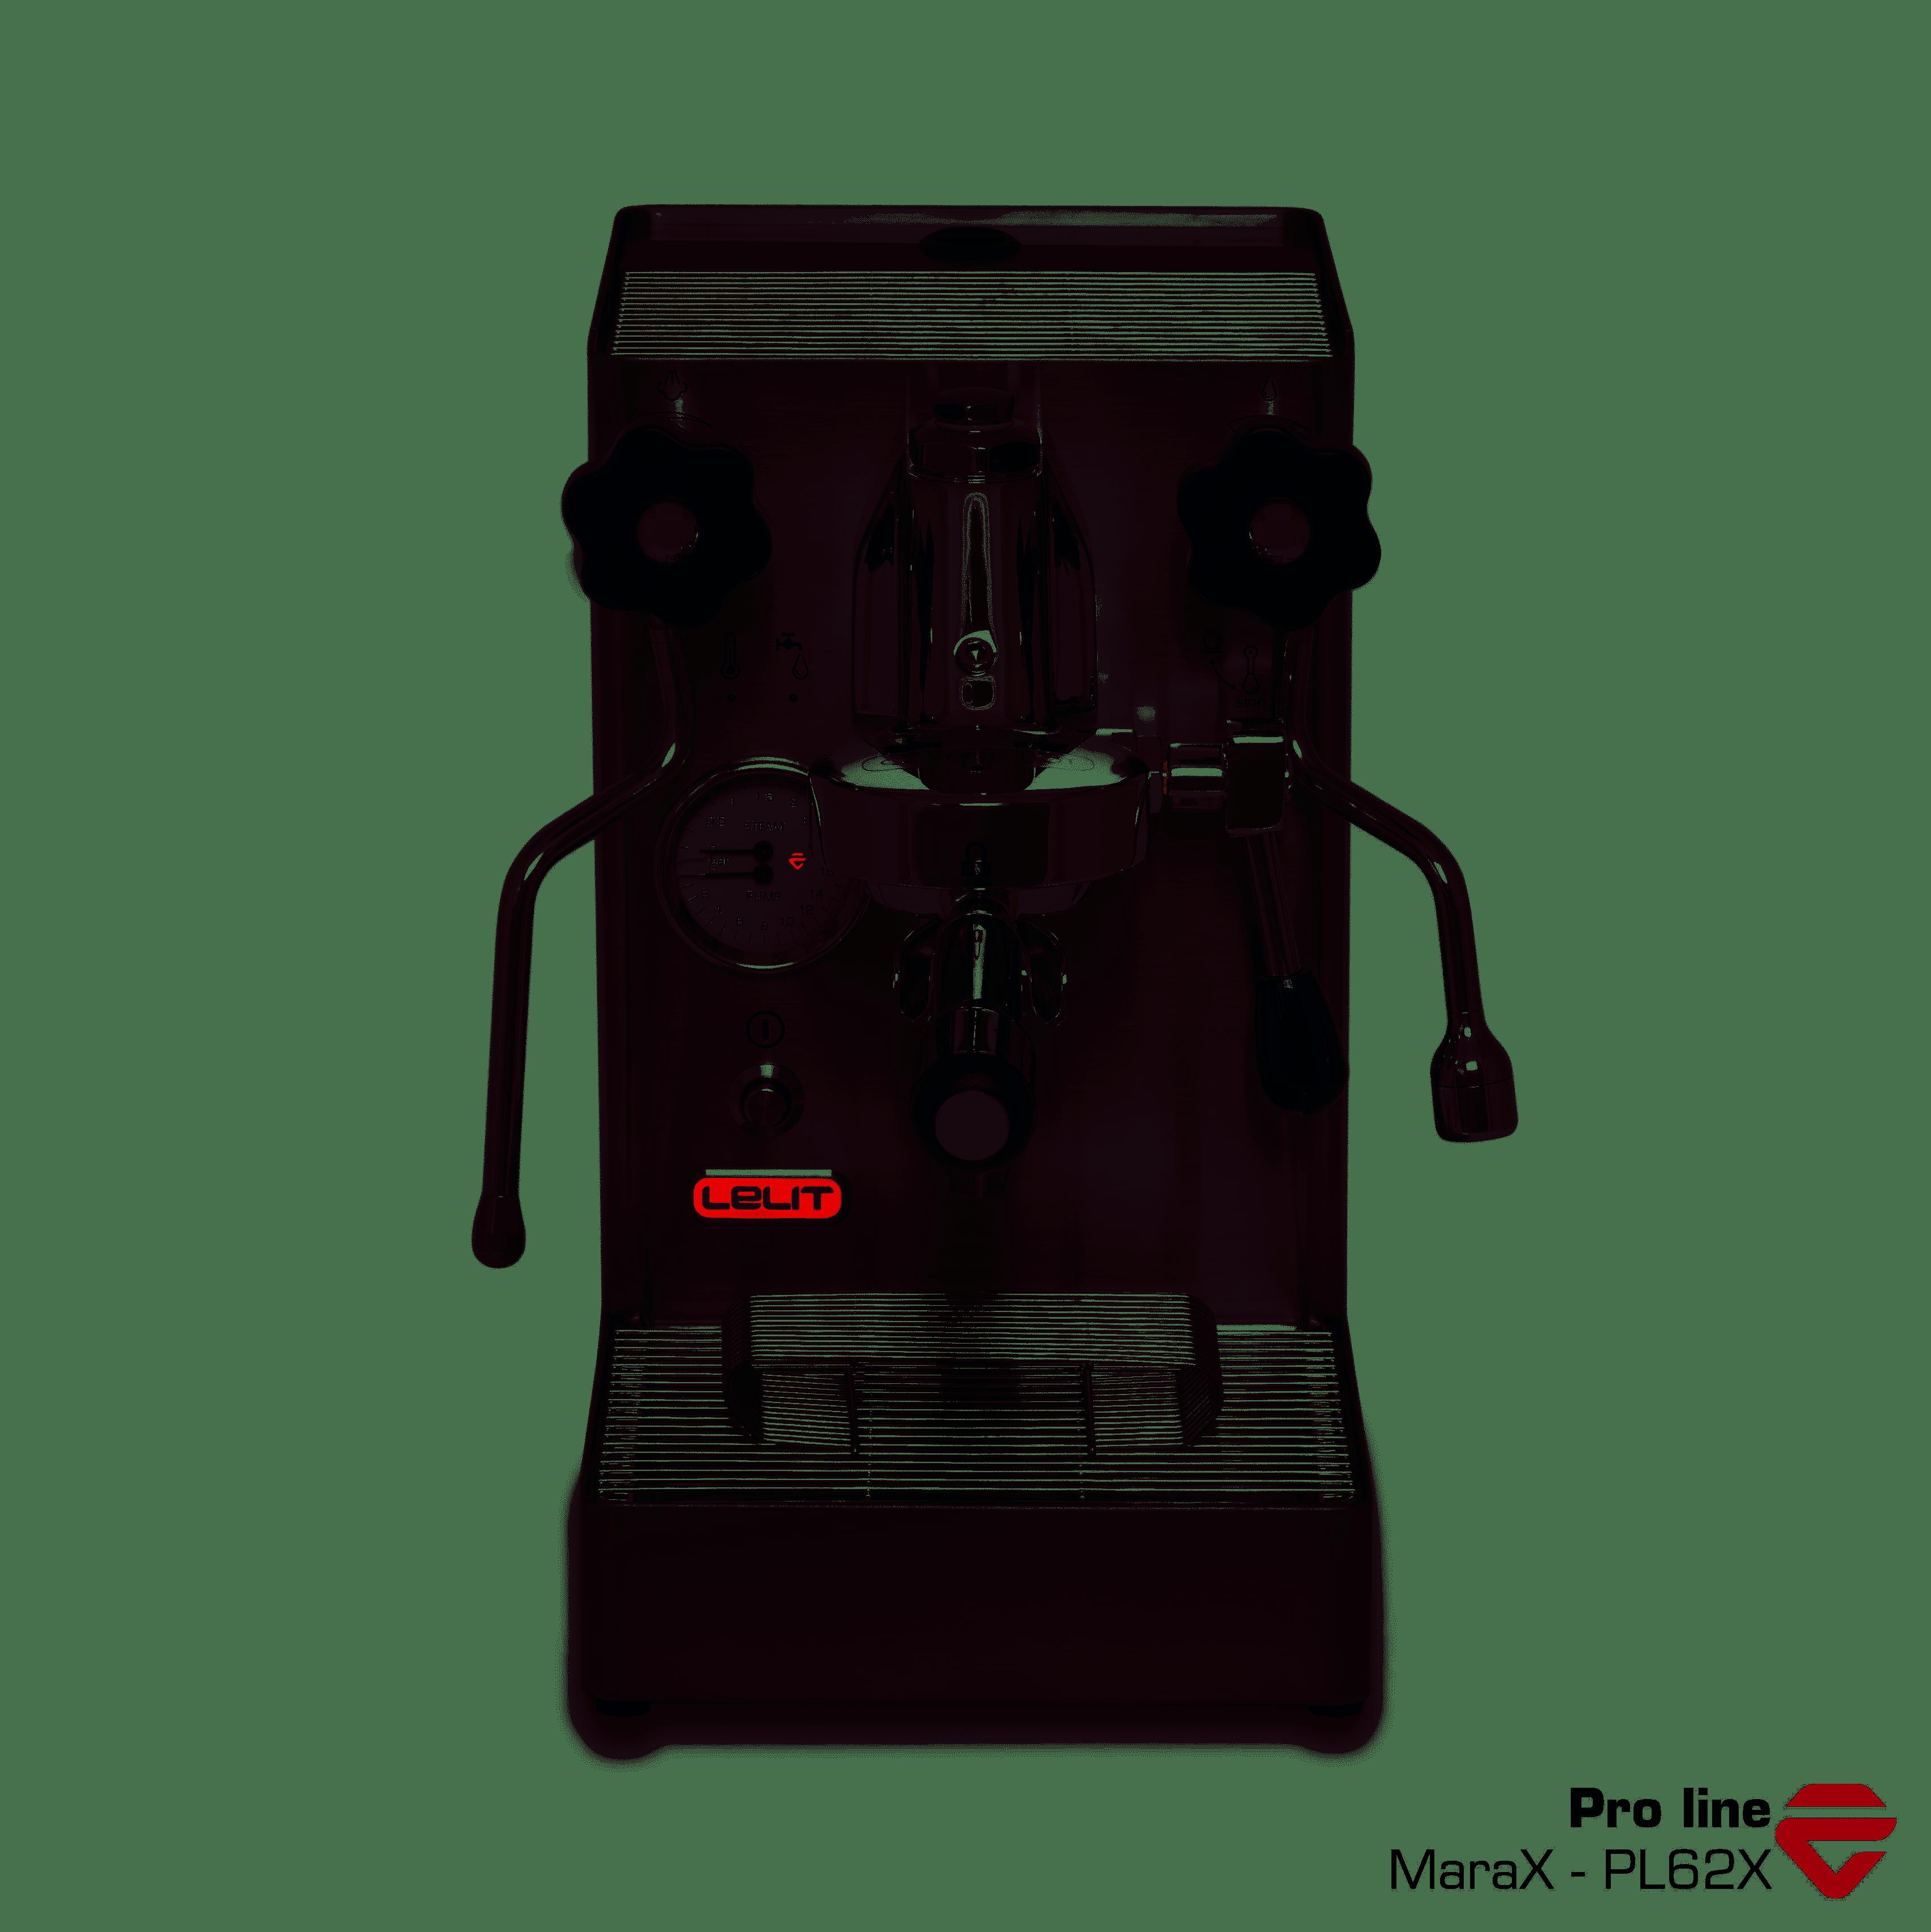 Lelit Mara PL62X Zweikreiser-Espressomaschine